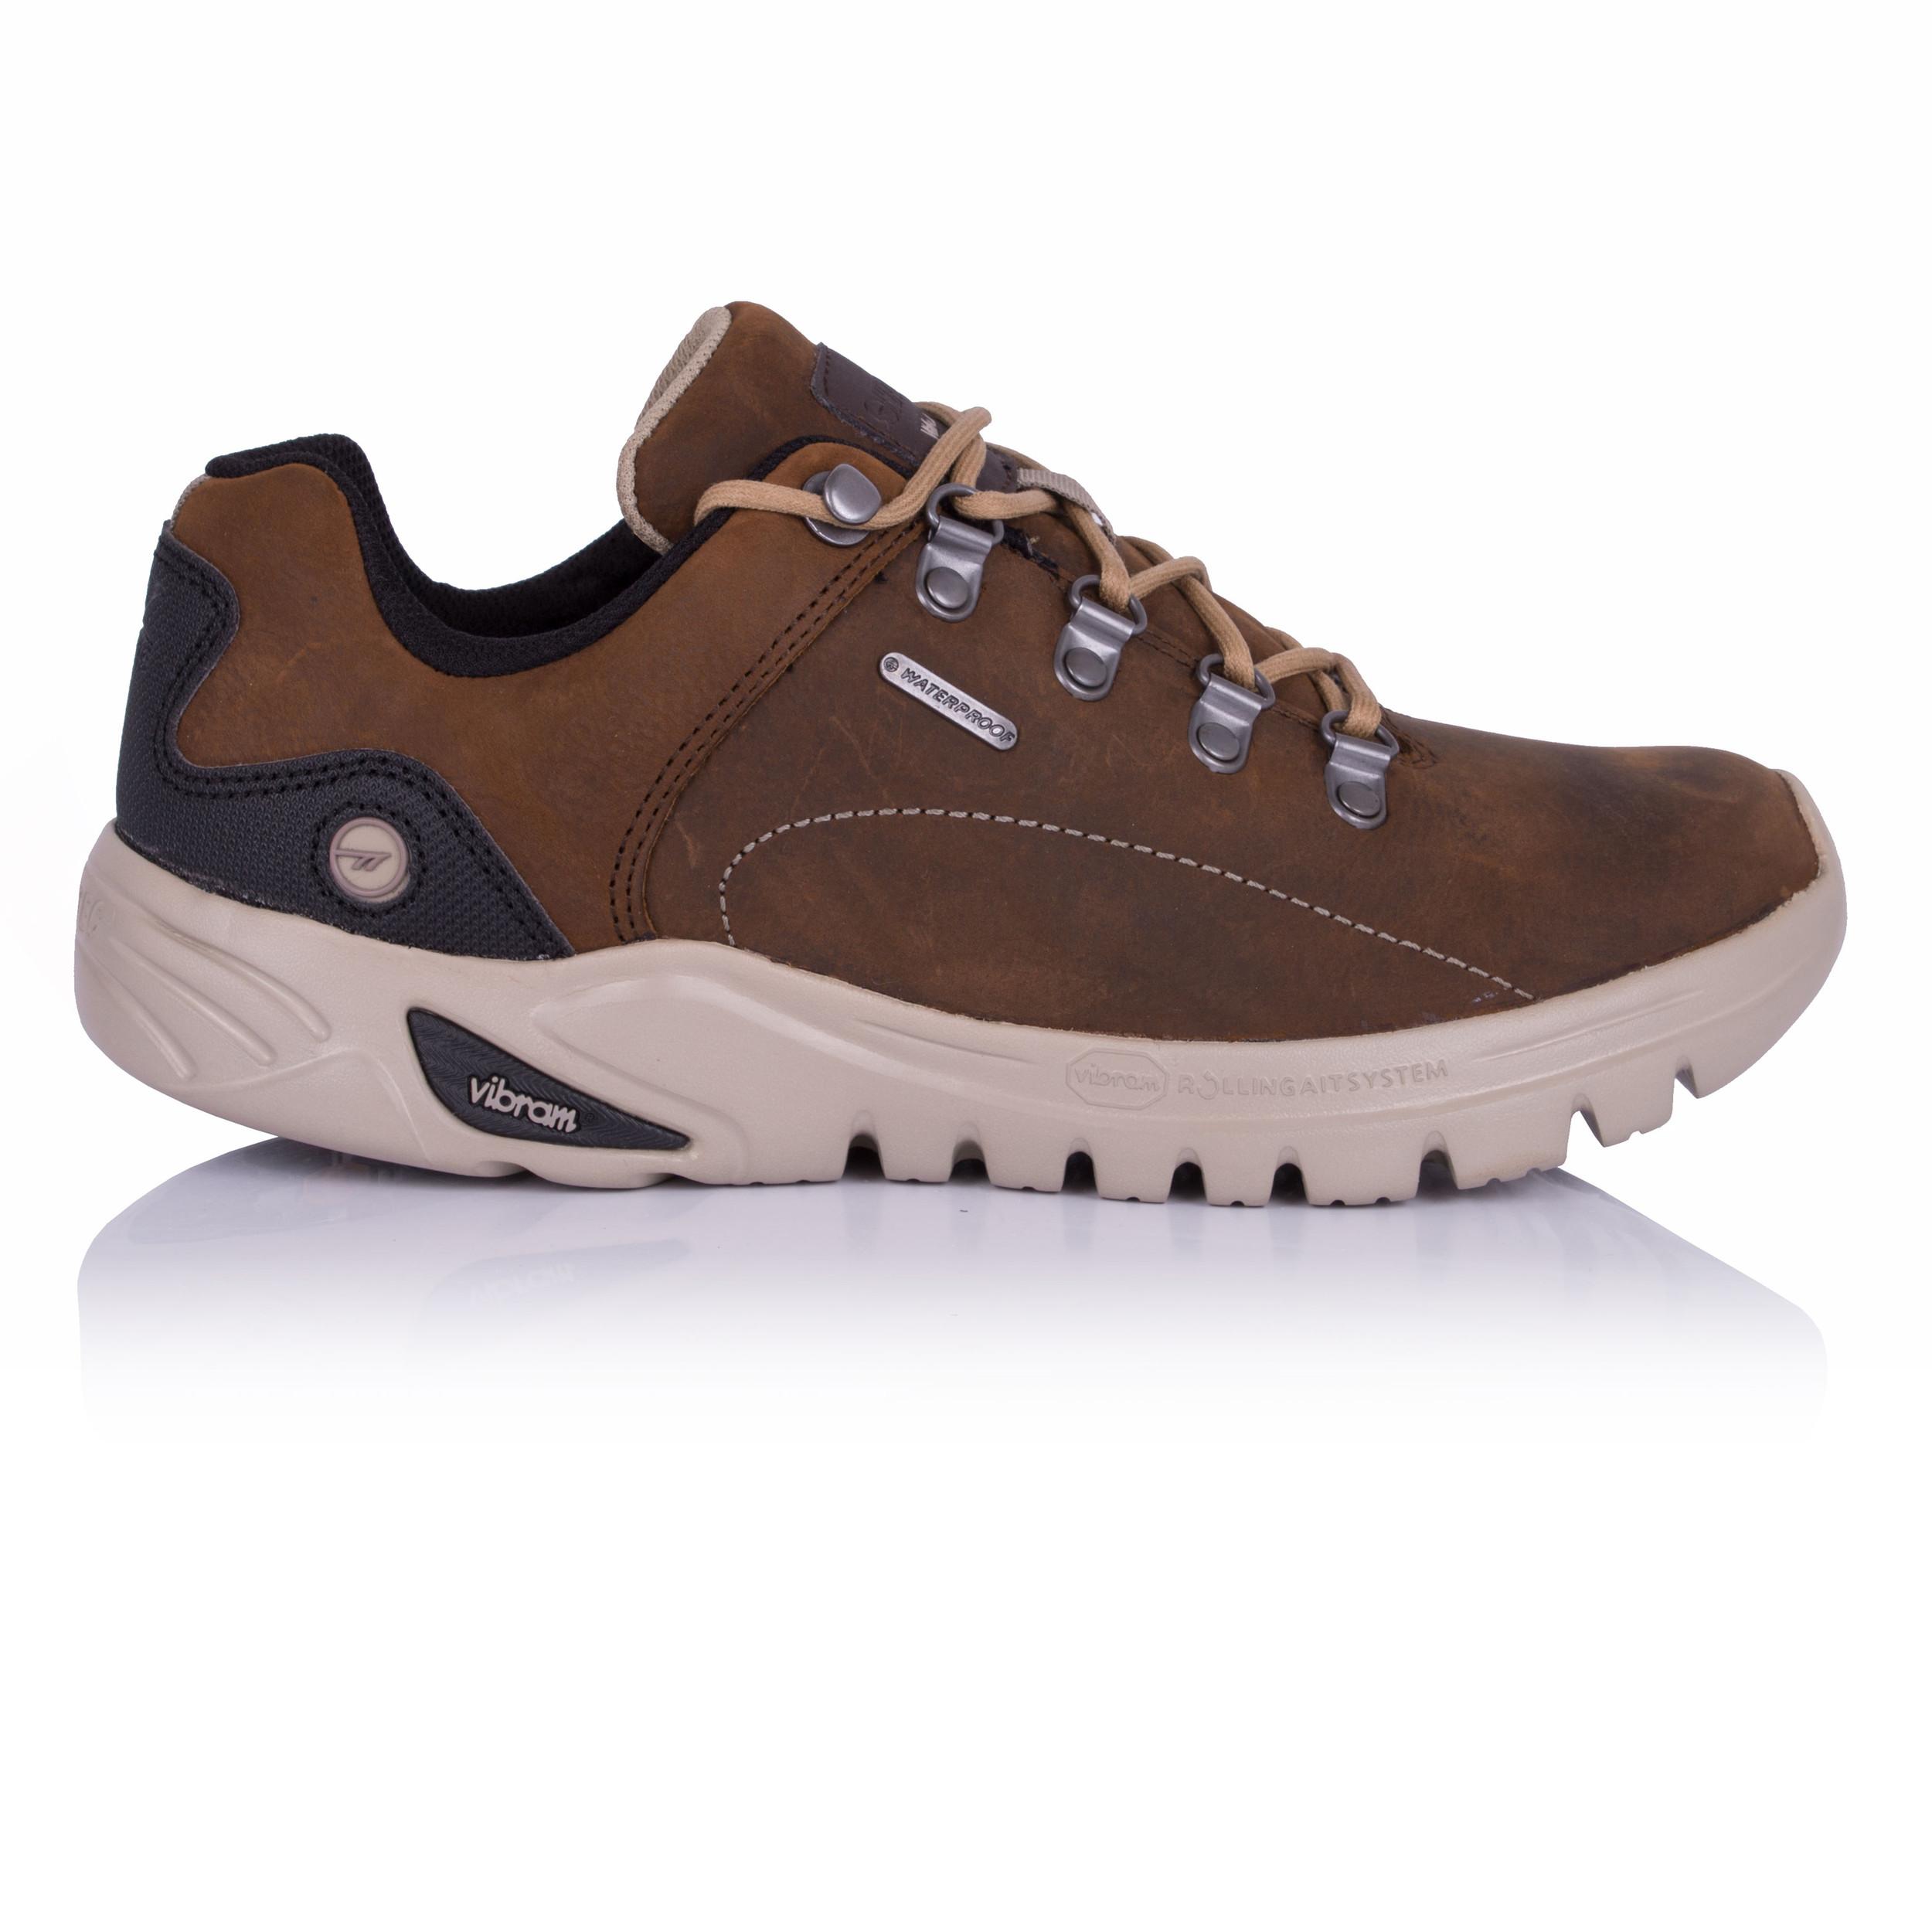 Hi-Tec V-Lite Walk-Lite Witton Trek Mens Waterproof Walking Sports Shoes